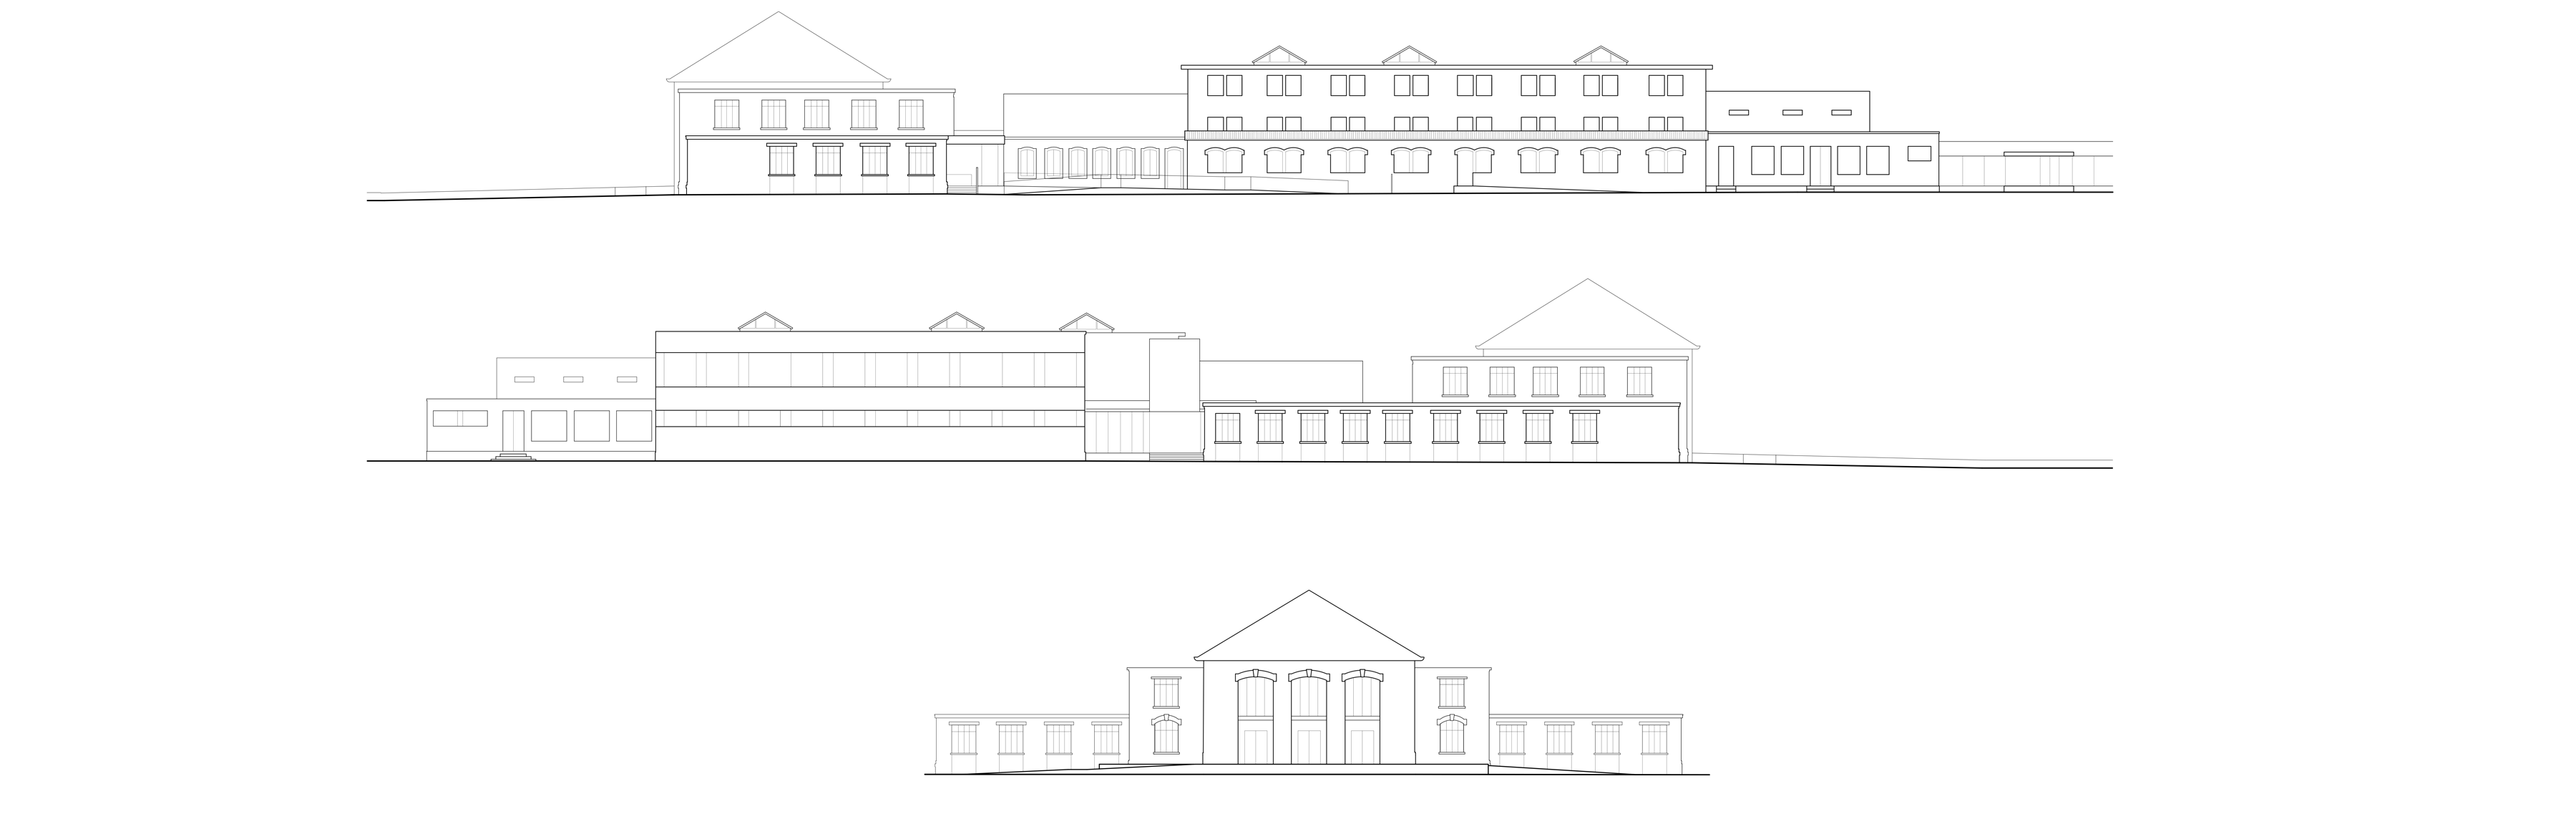 Photo - façades